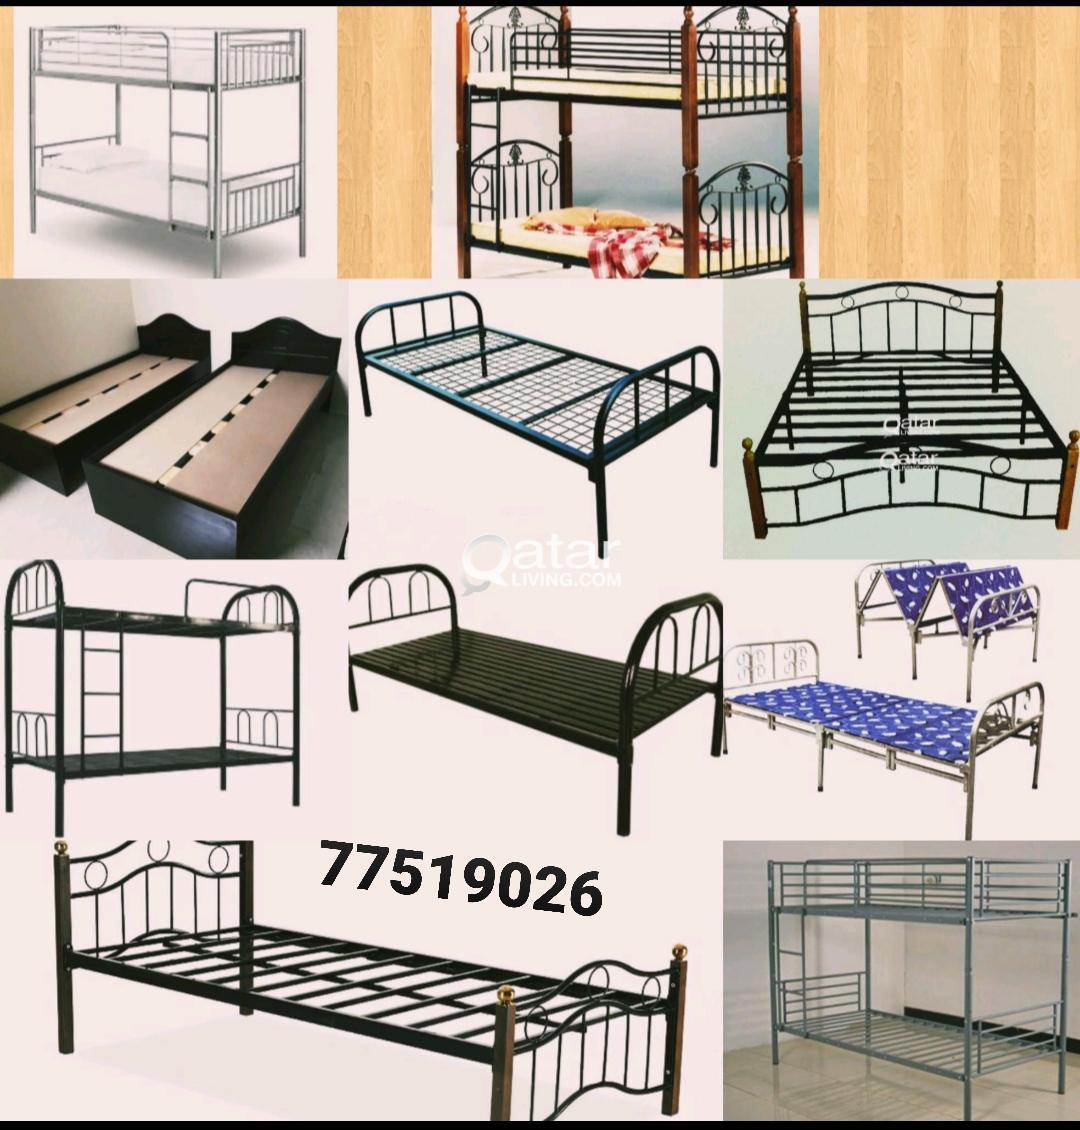 Wholesale price brand new furniture and mattress w